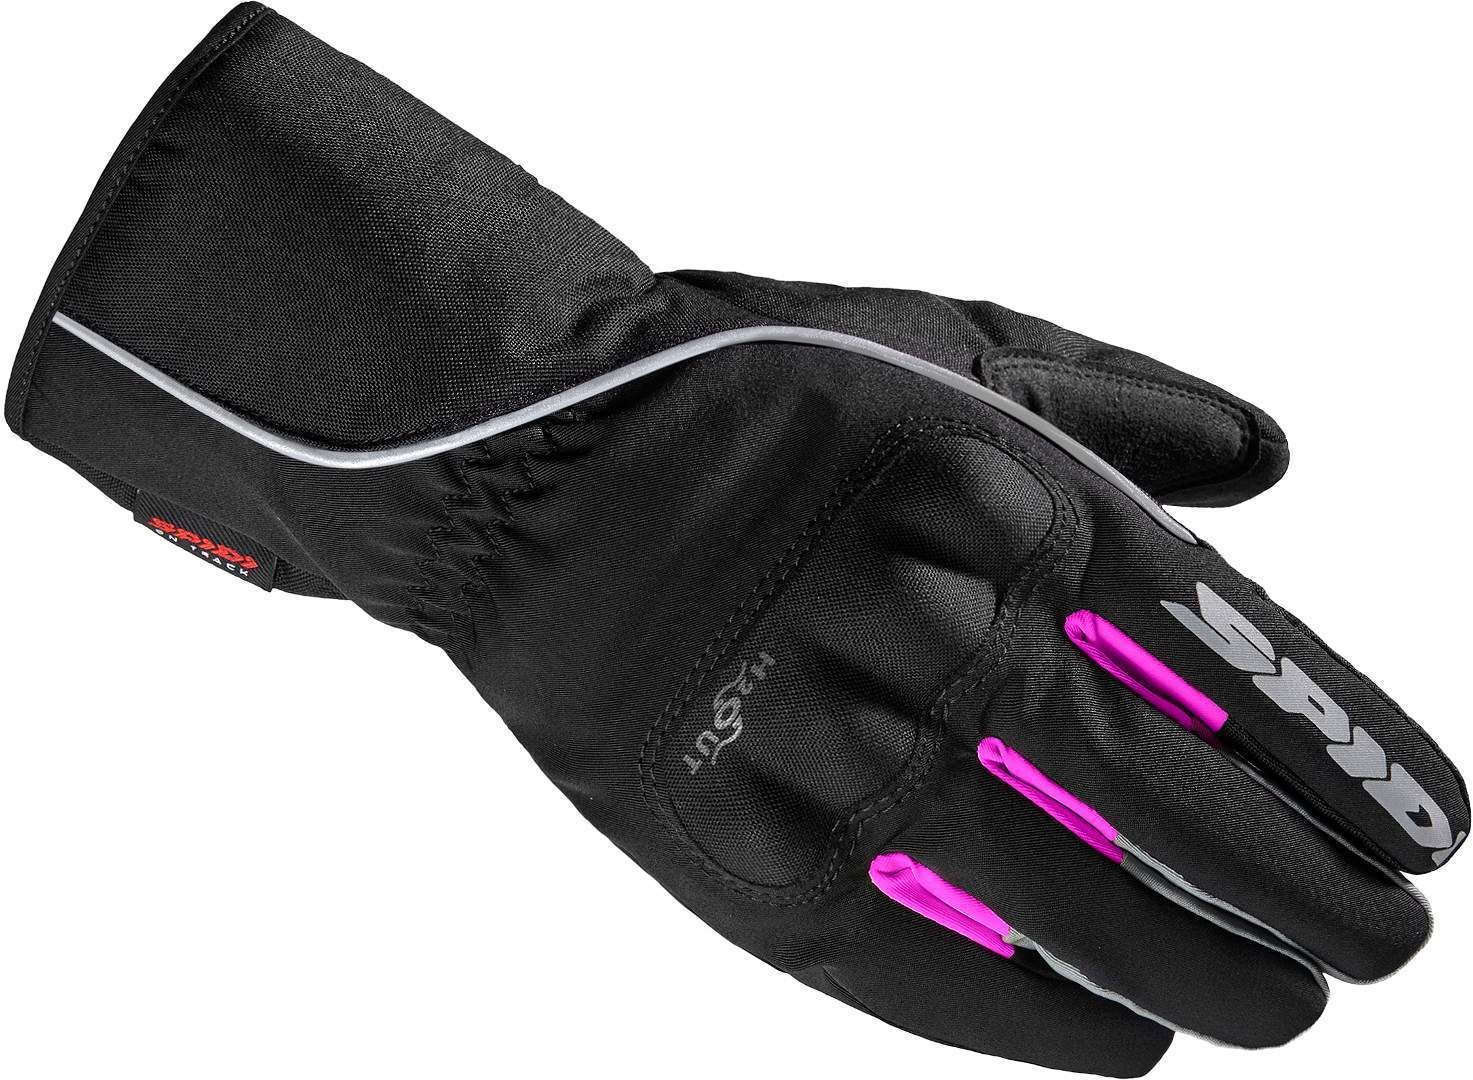 Spidi WNT-2 Damen Motorrad Handschuhe, schwarz-pink, Größe M, schwarz-pink, Größe M